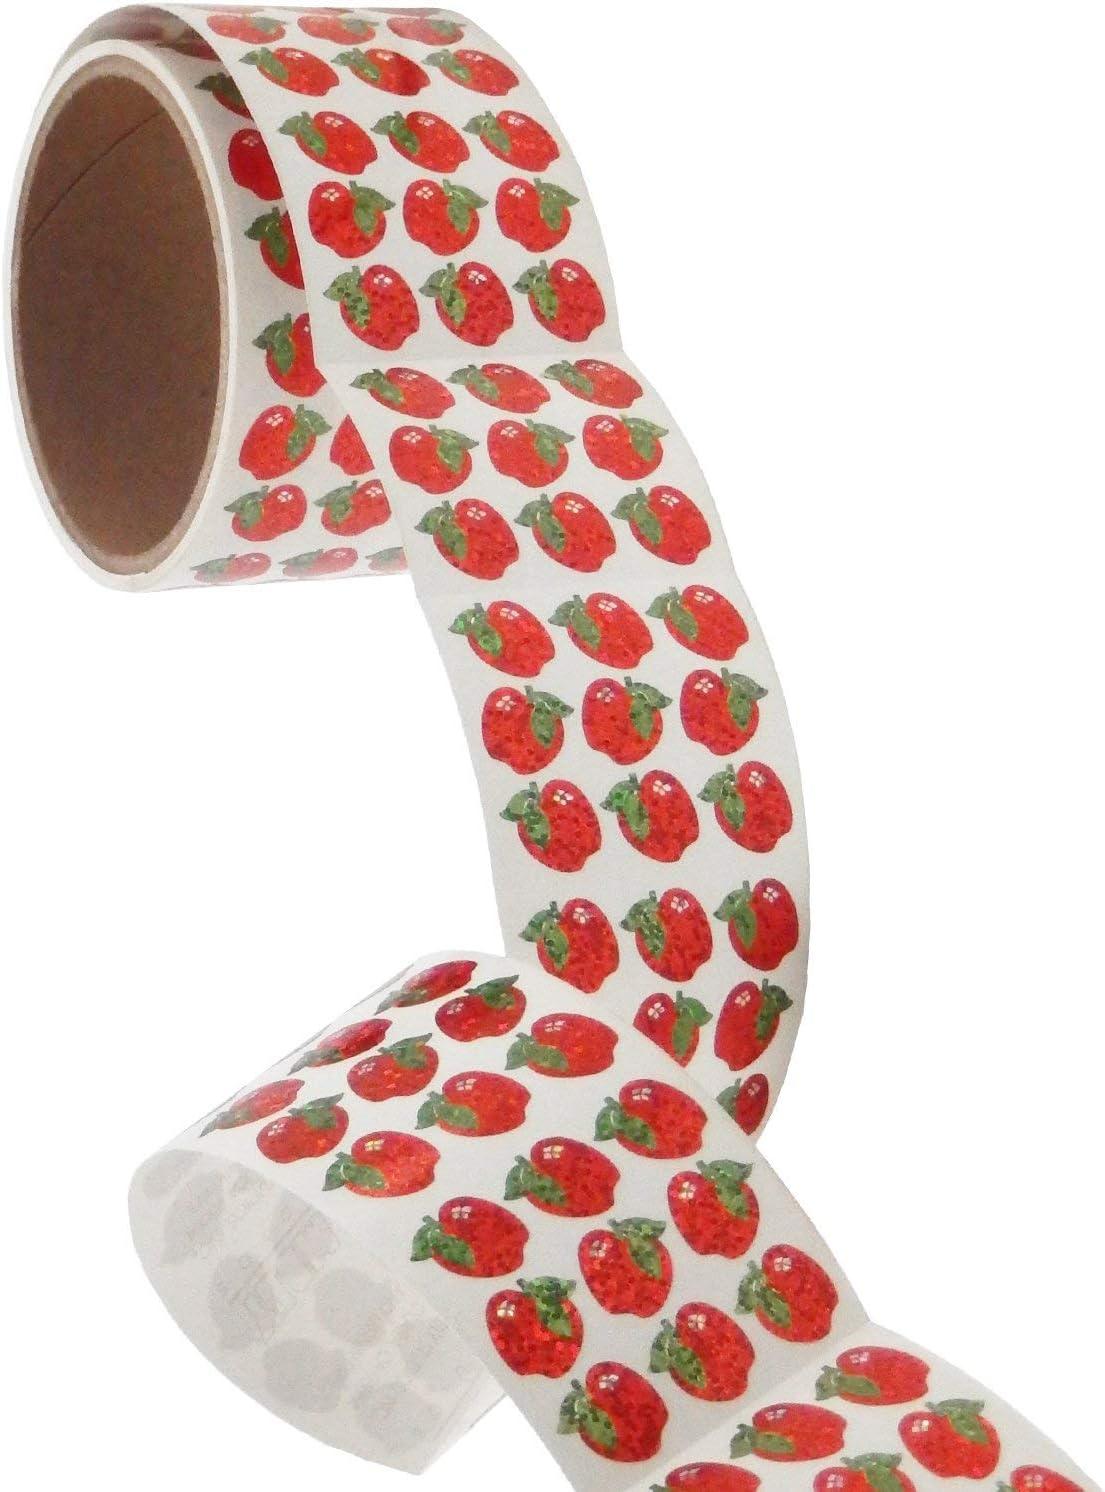 Bulk Roll Prismatic Stickers, Micro Apples (100 Repeats)